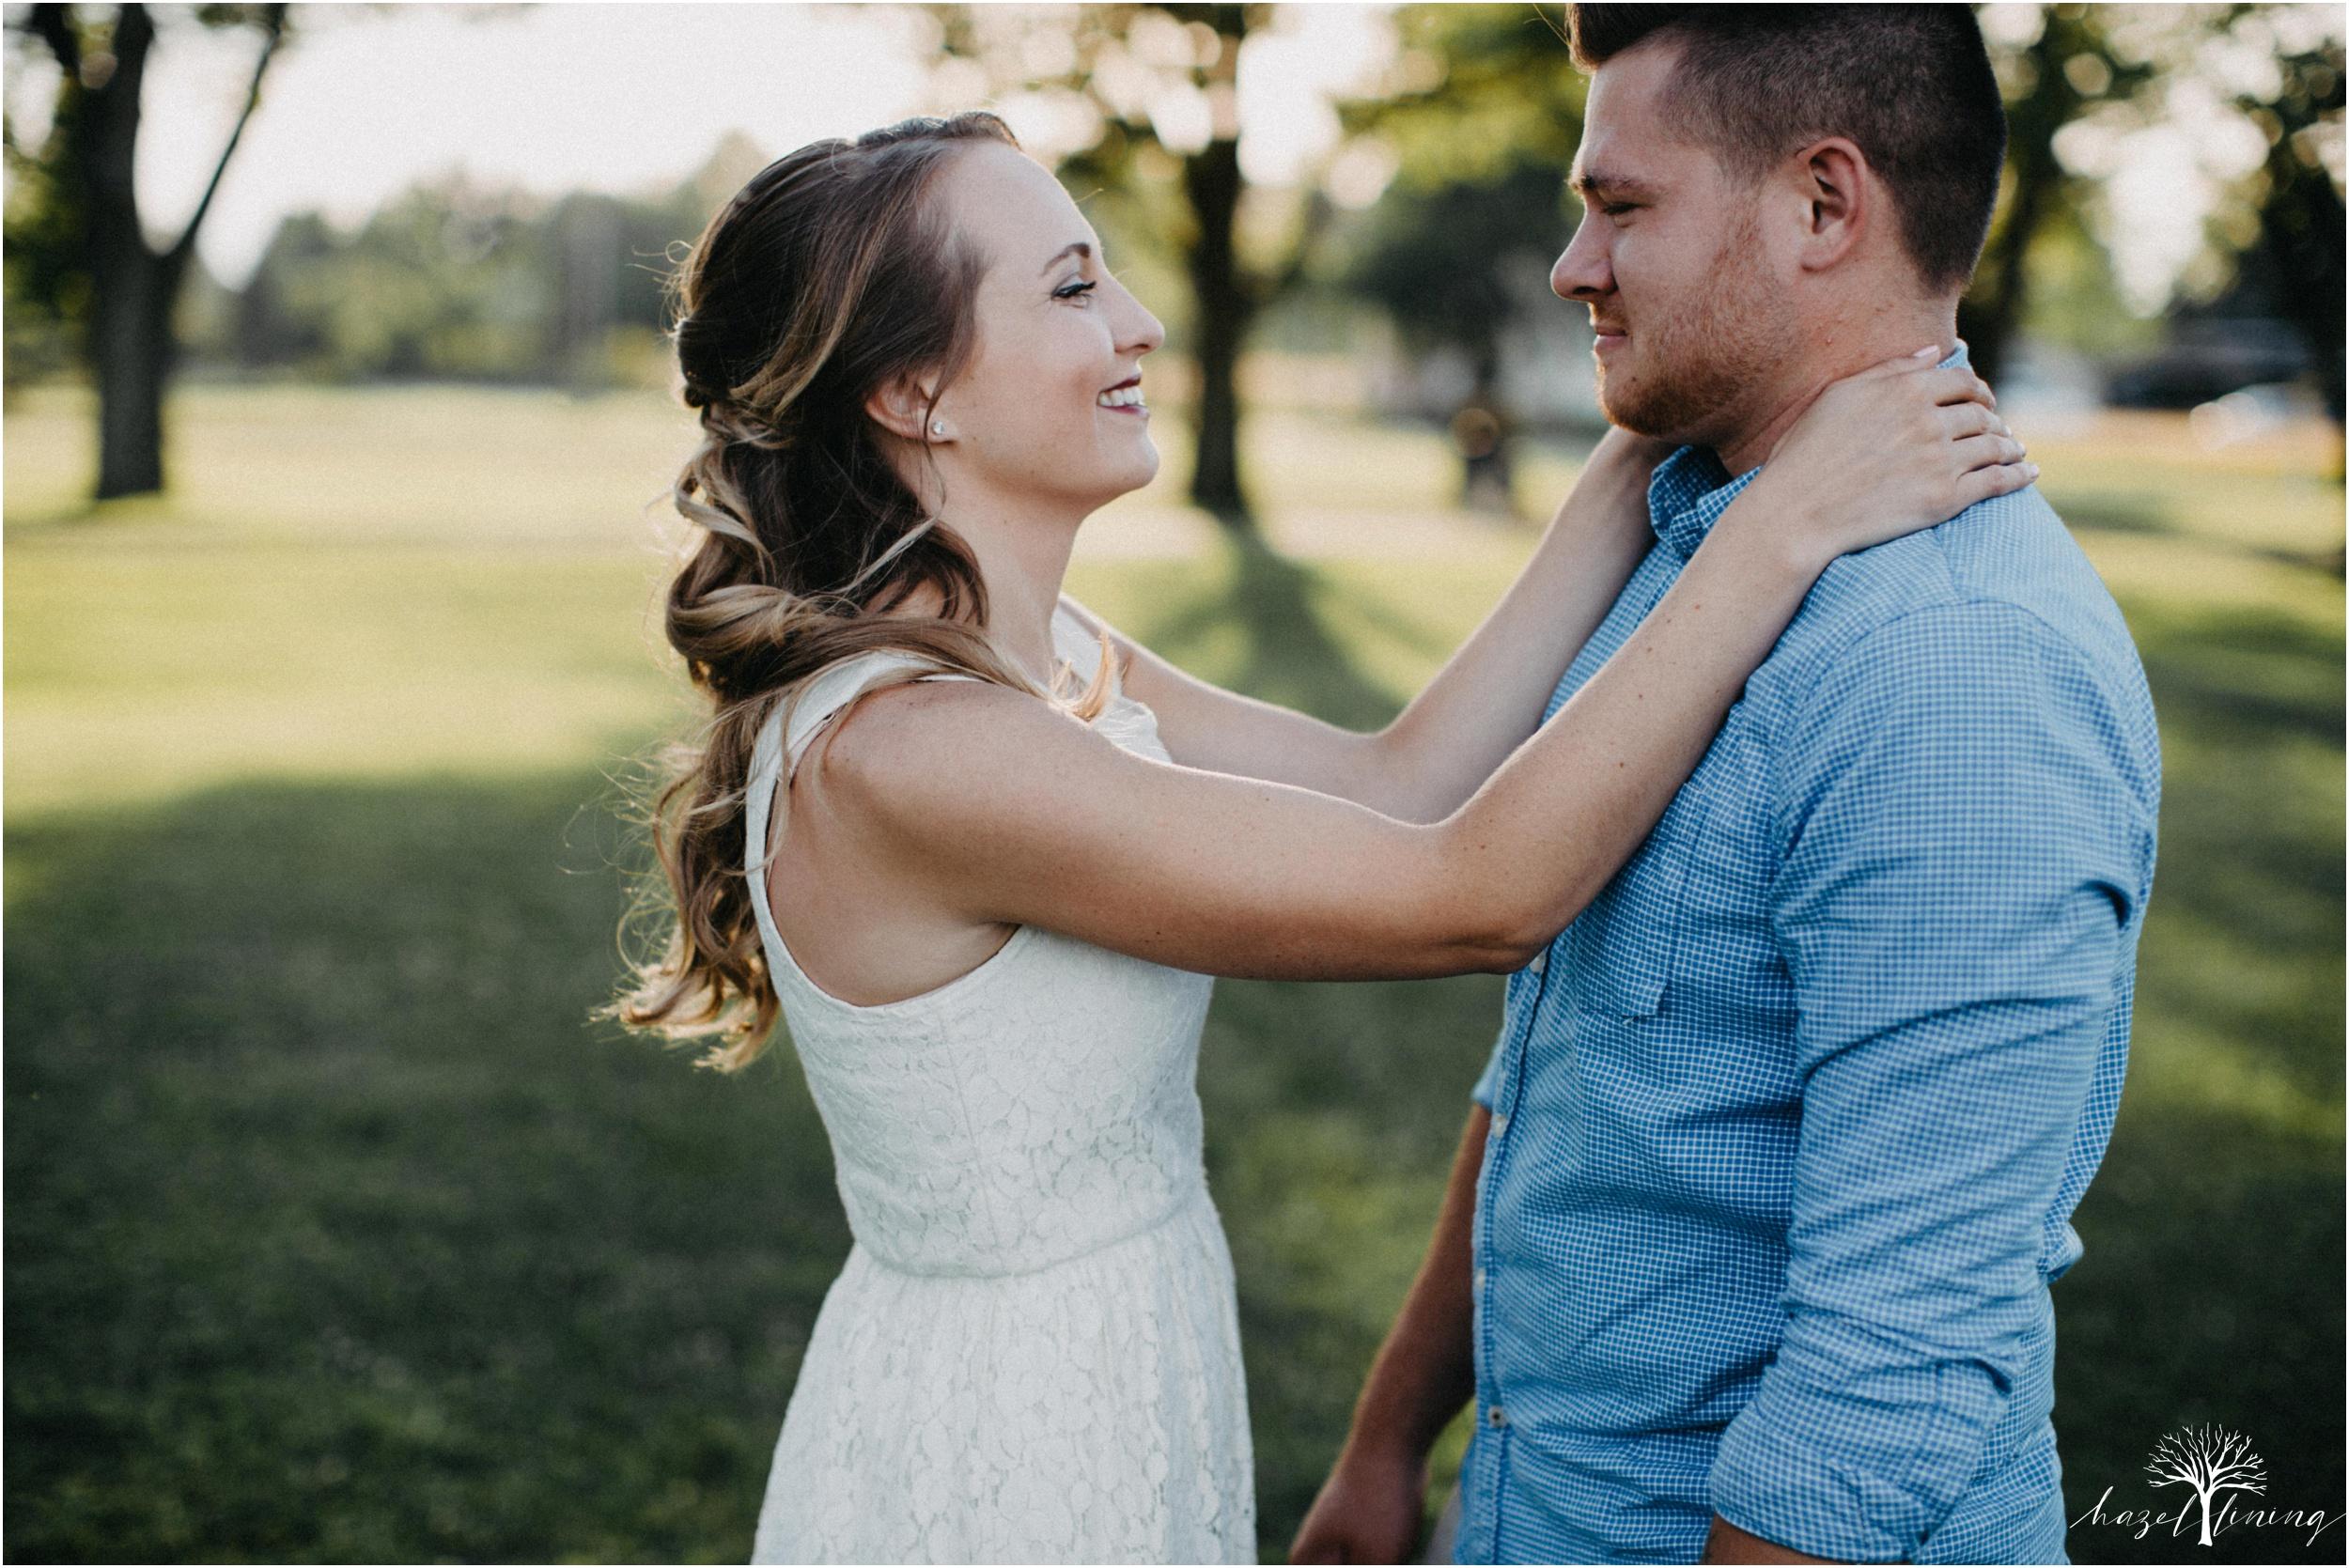 rachel-warner-chris-niedrist-the-farm-bakery-and-events-quakertown-pa-summer-engagement-hazel-lining-photography-destination-elopement-wedding-engagement-photography_0009.jpg